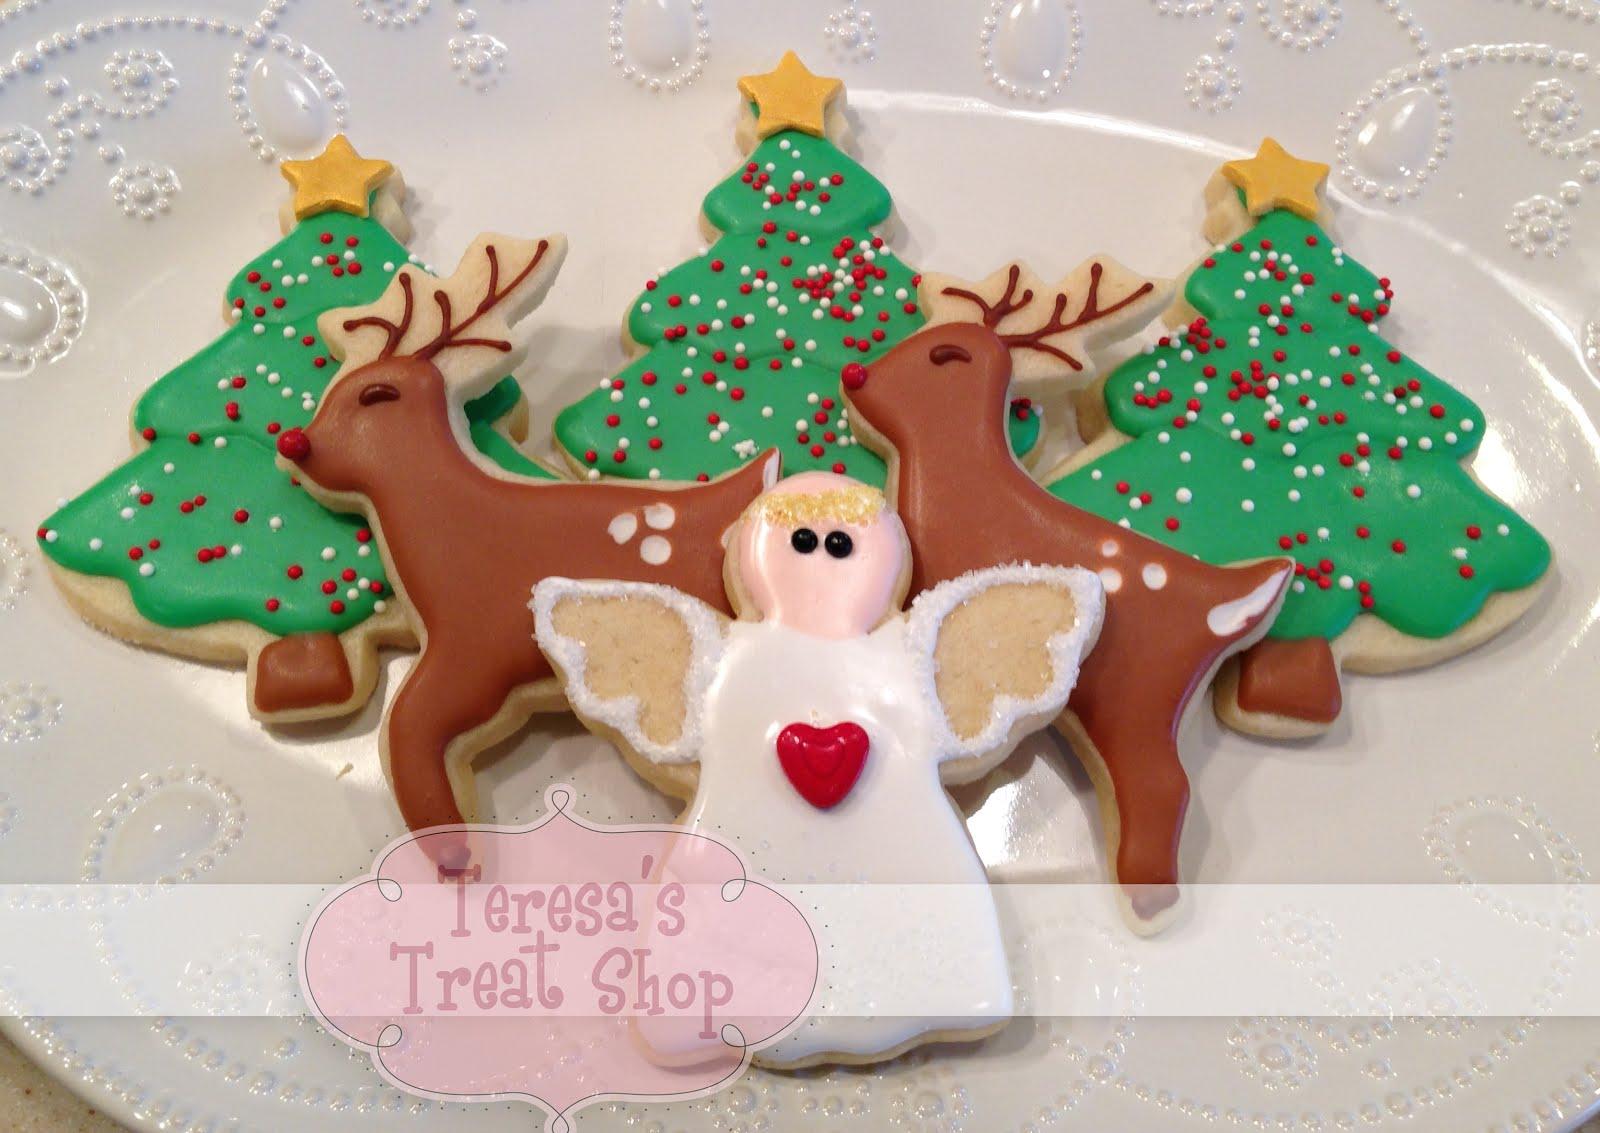 Christmas Angels Reindeer And Trees